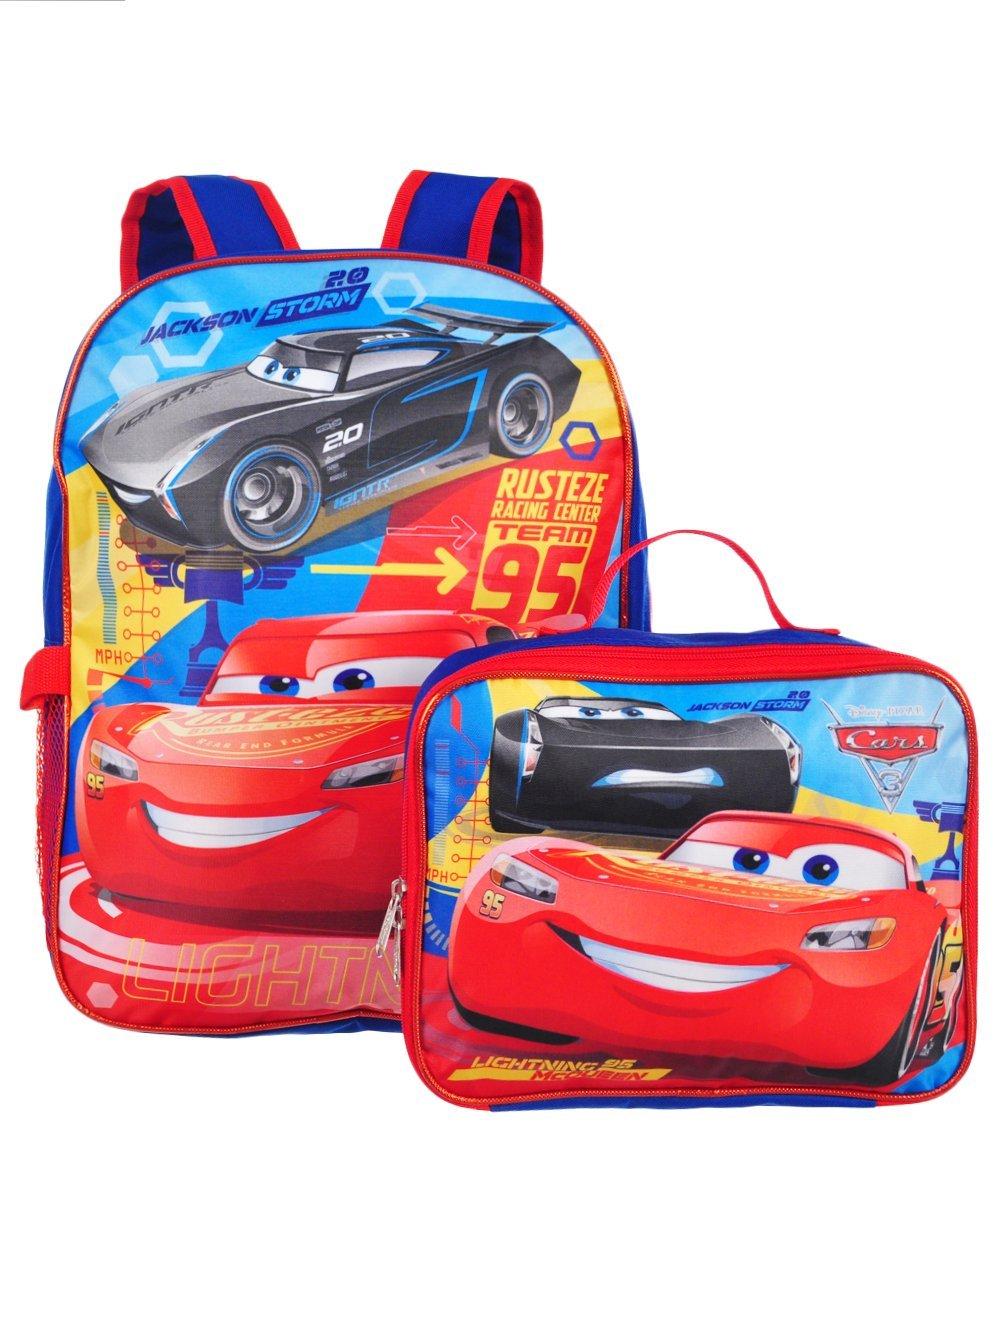 e1036fd9500 Cars Disney Pixar Jackson   Lightning McQueen 16